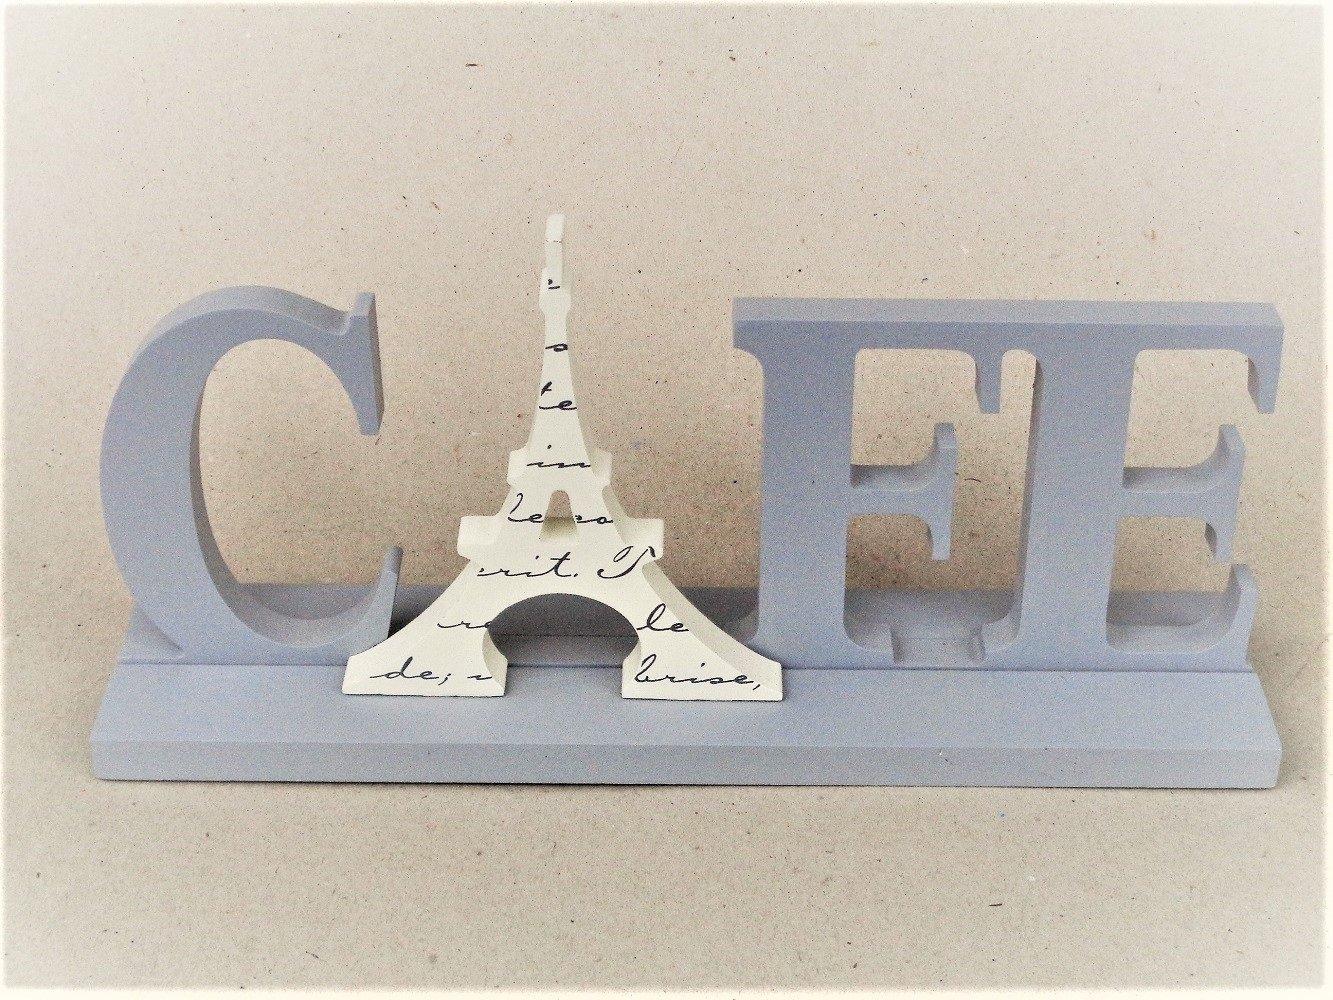 French Café Sign Eiffel Tower